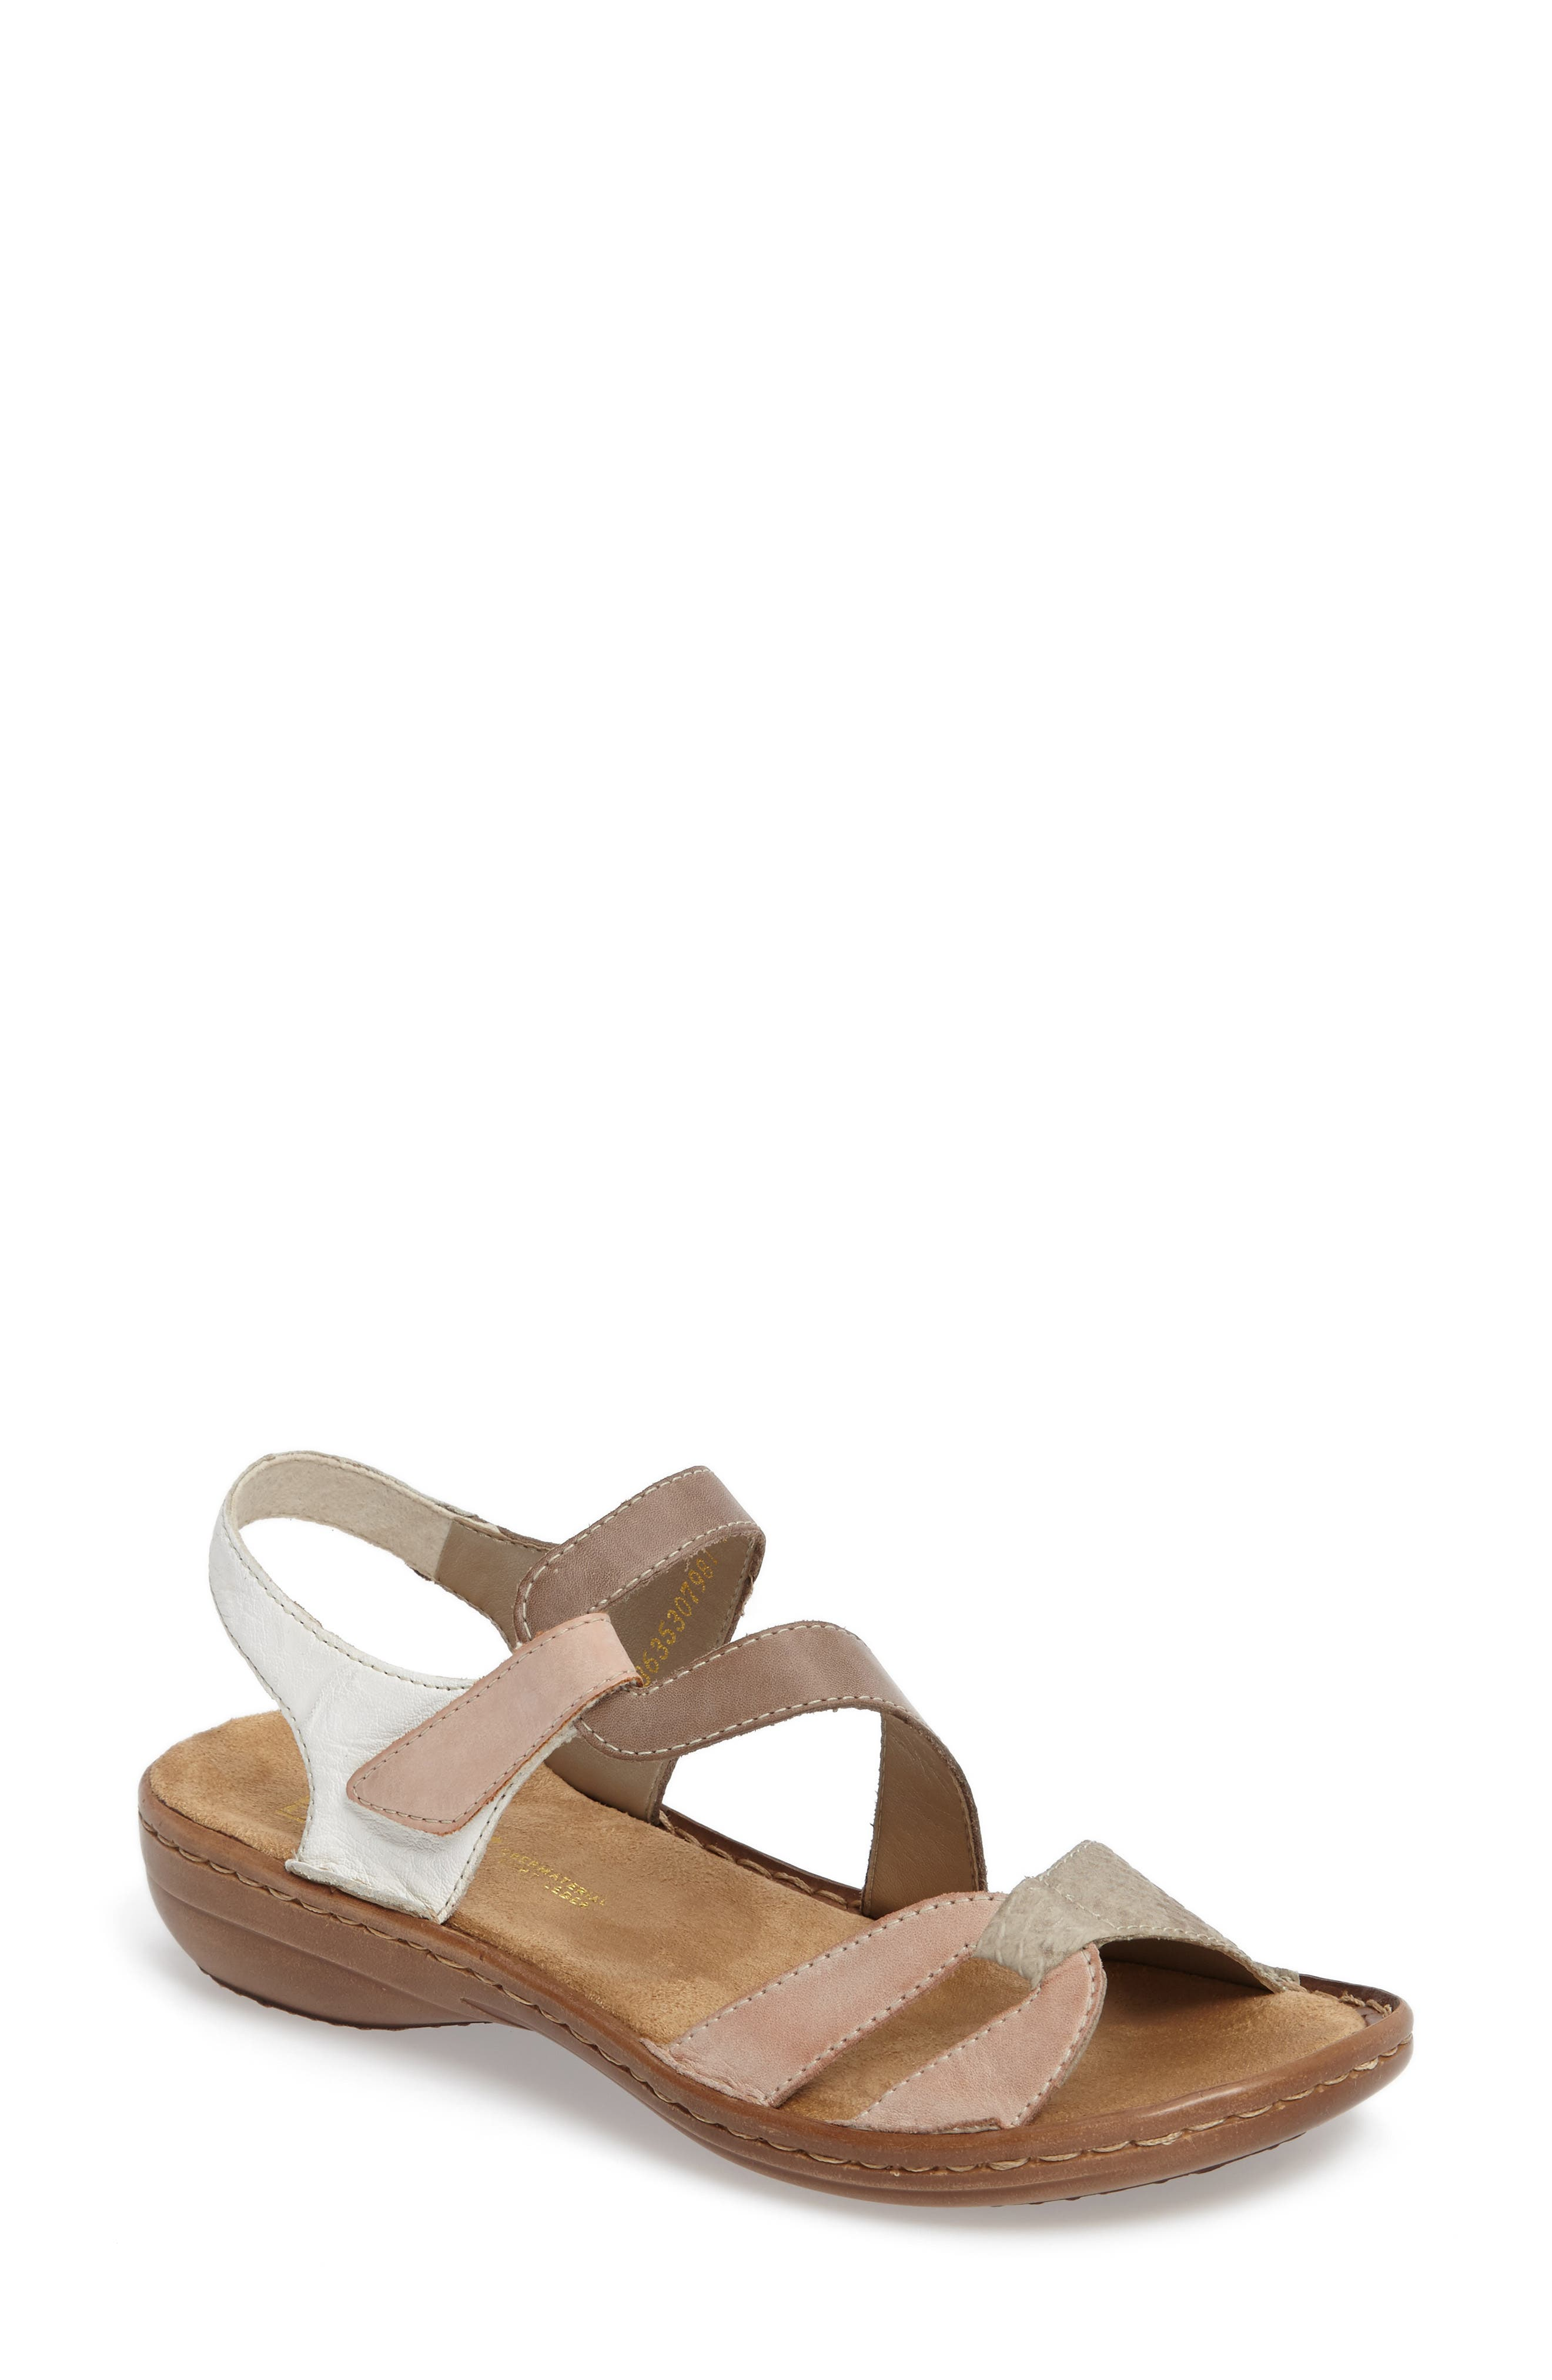 Rieker Antistress Regina 66 Wedge Sandal (Women)